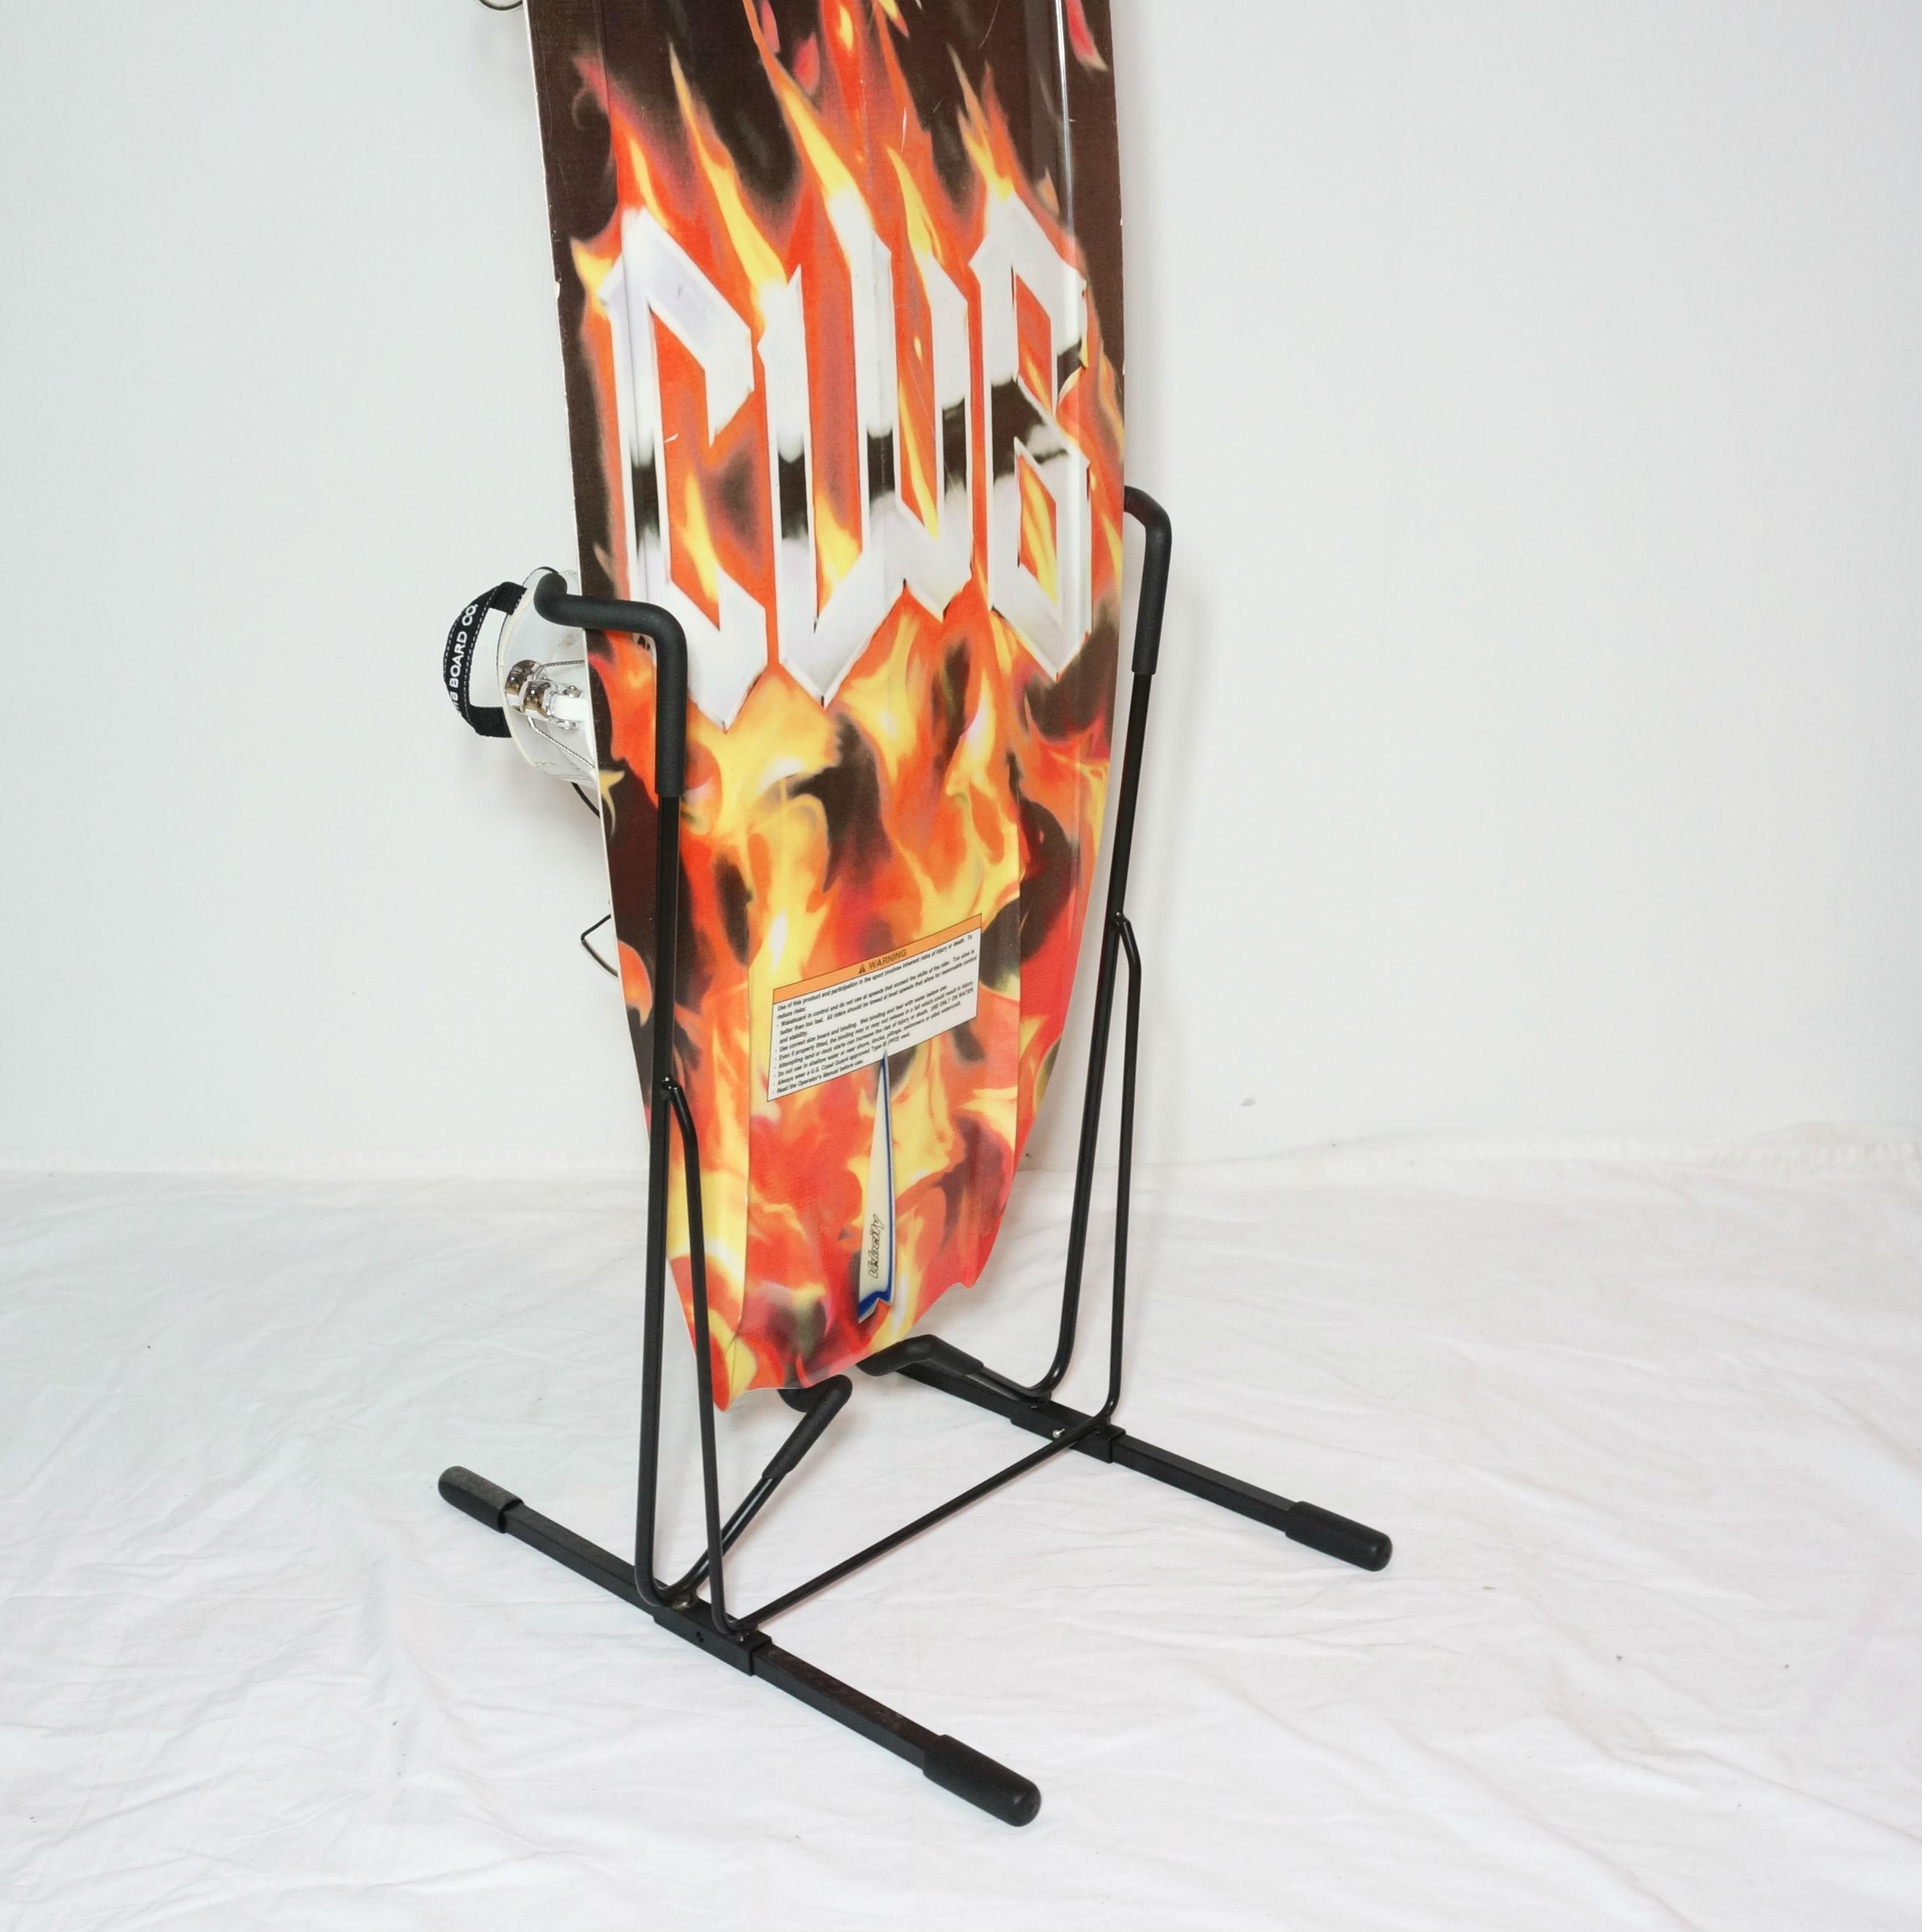 metal-floor-stand-for-wakeboard.jpg